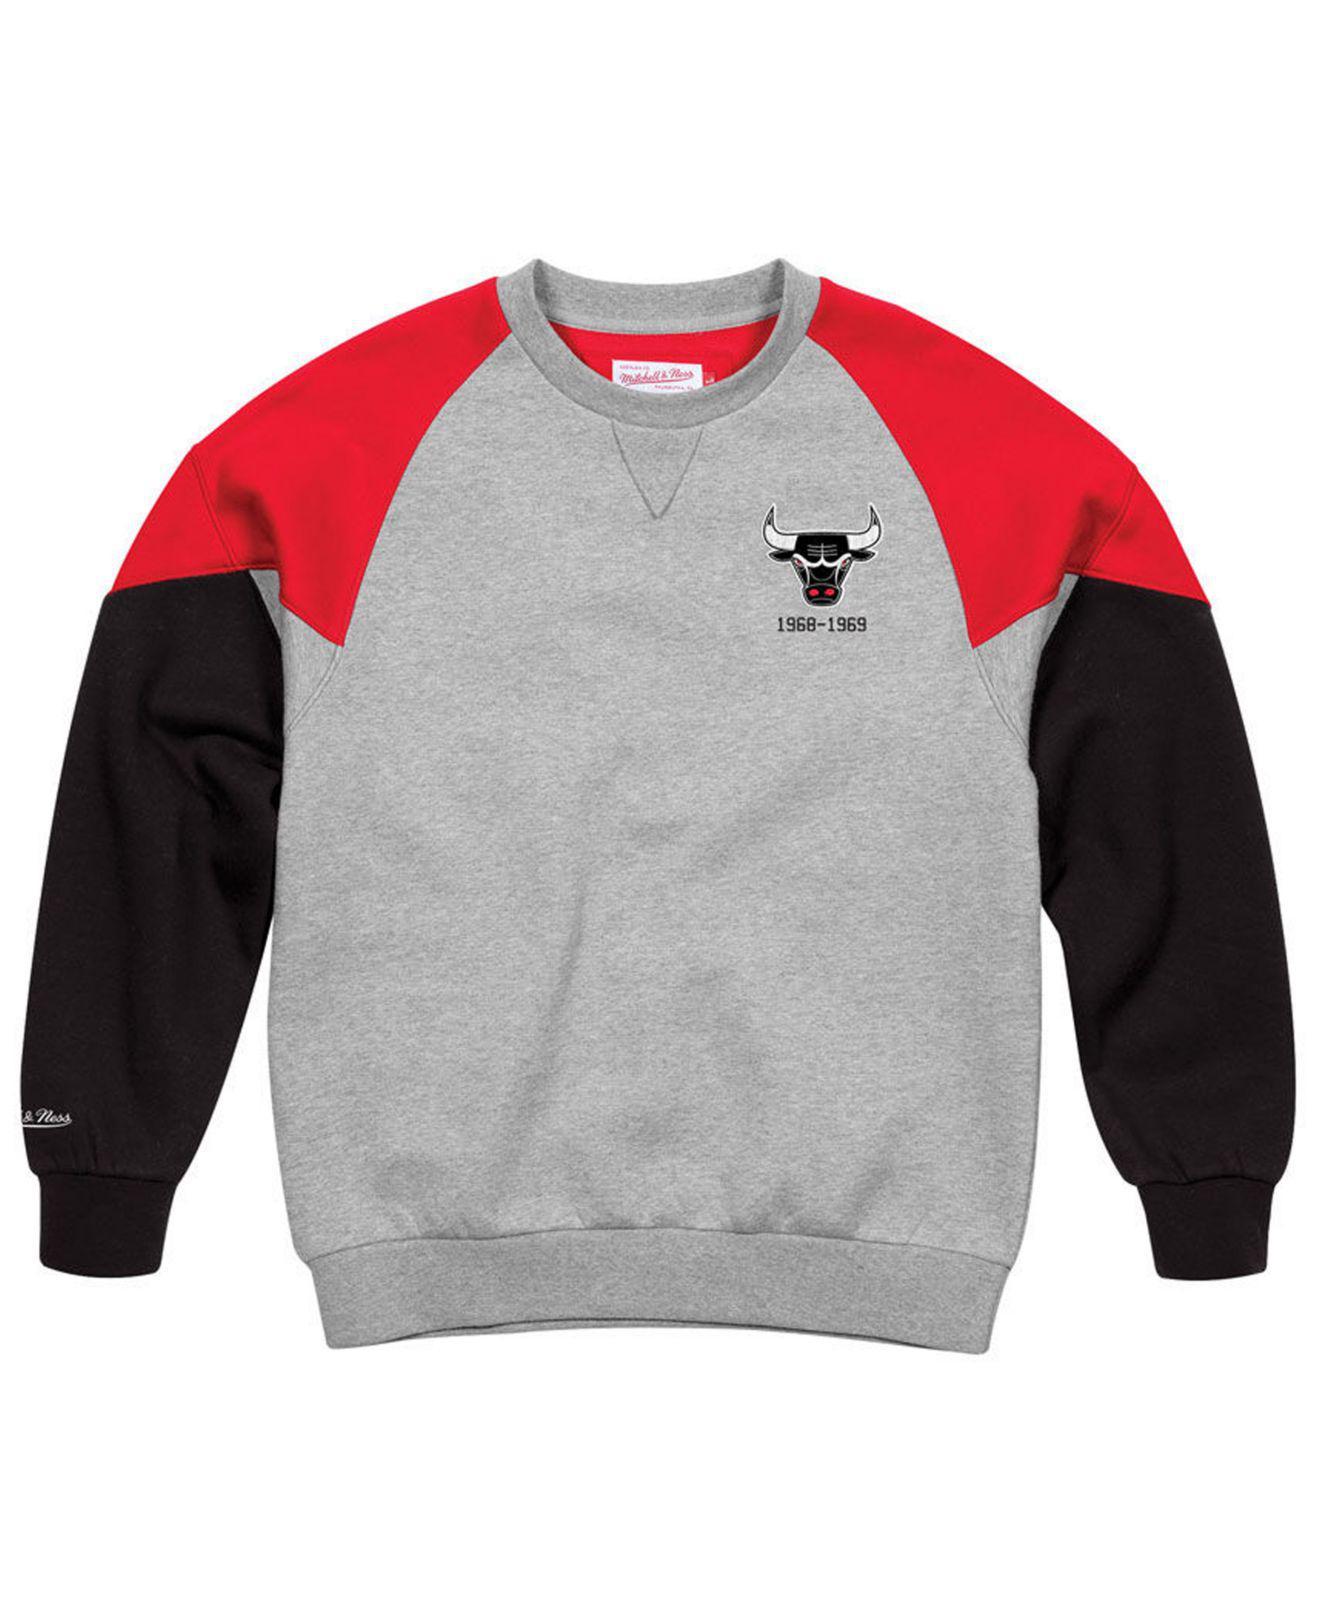 Mitchell /& Ness Chicago Bulls Trading Block Crew Sweatshirt Grey CBU FKC